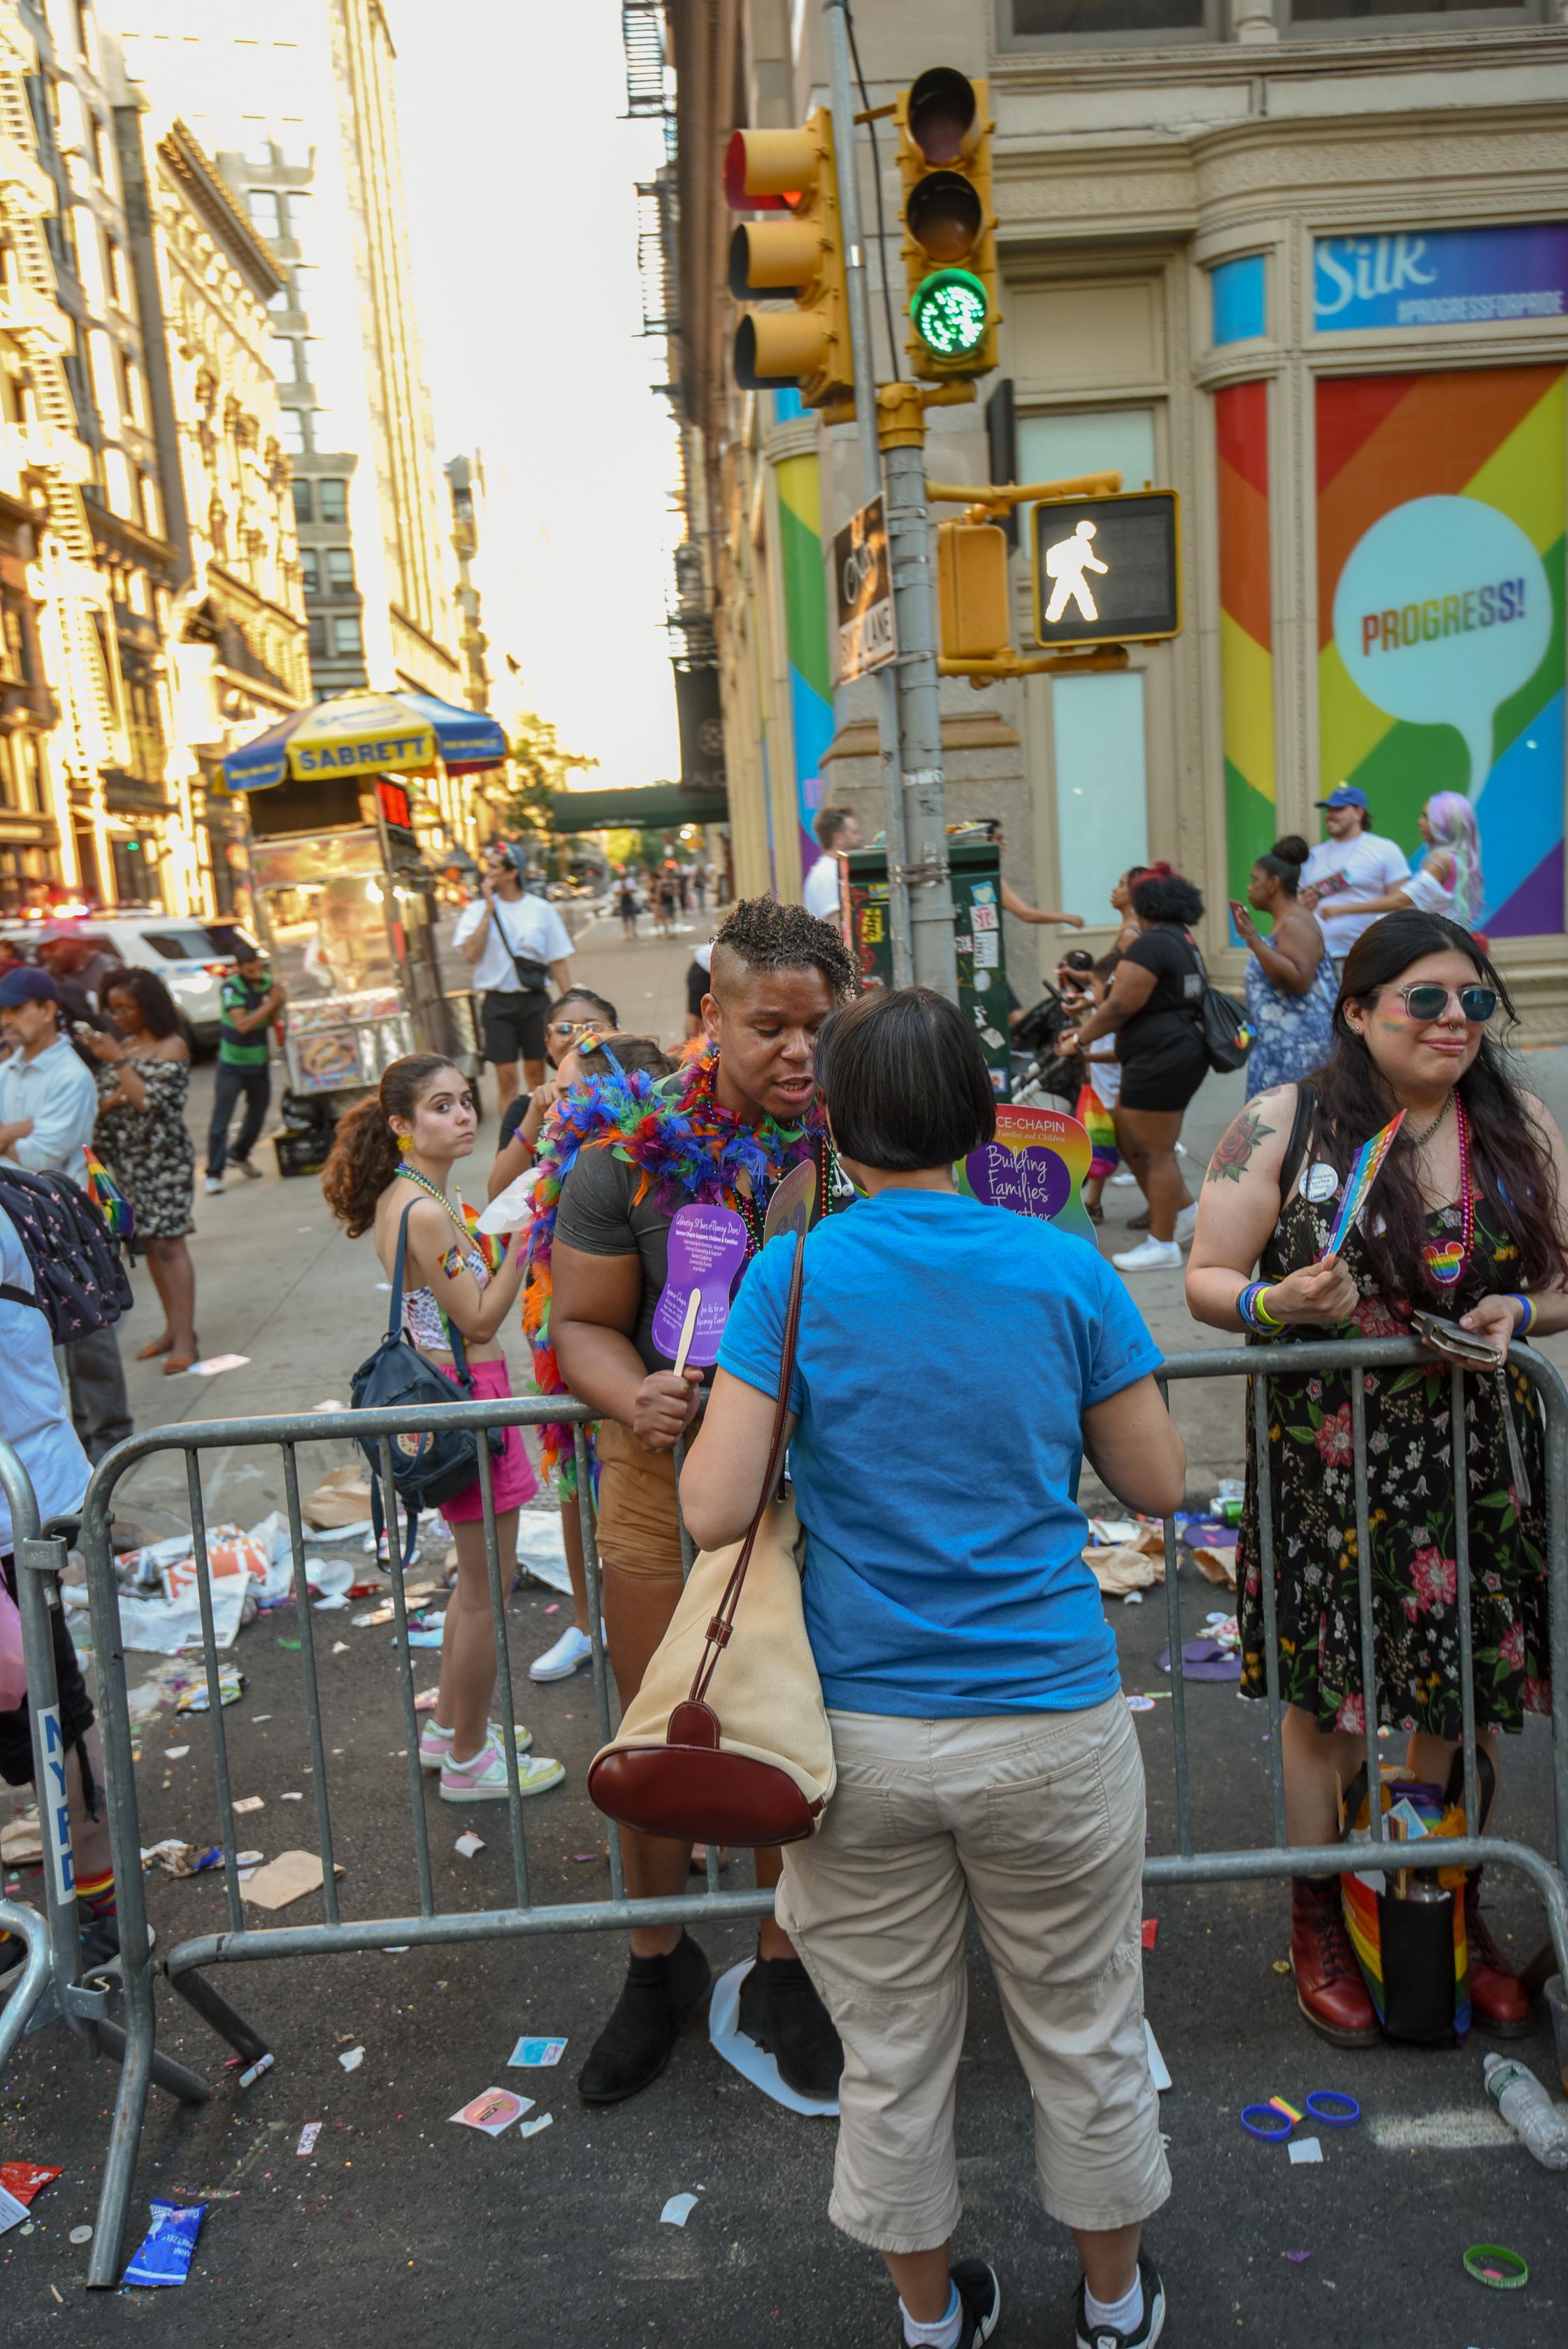 SC-PrideParade-2019_FE-319.jpg